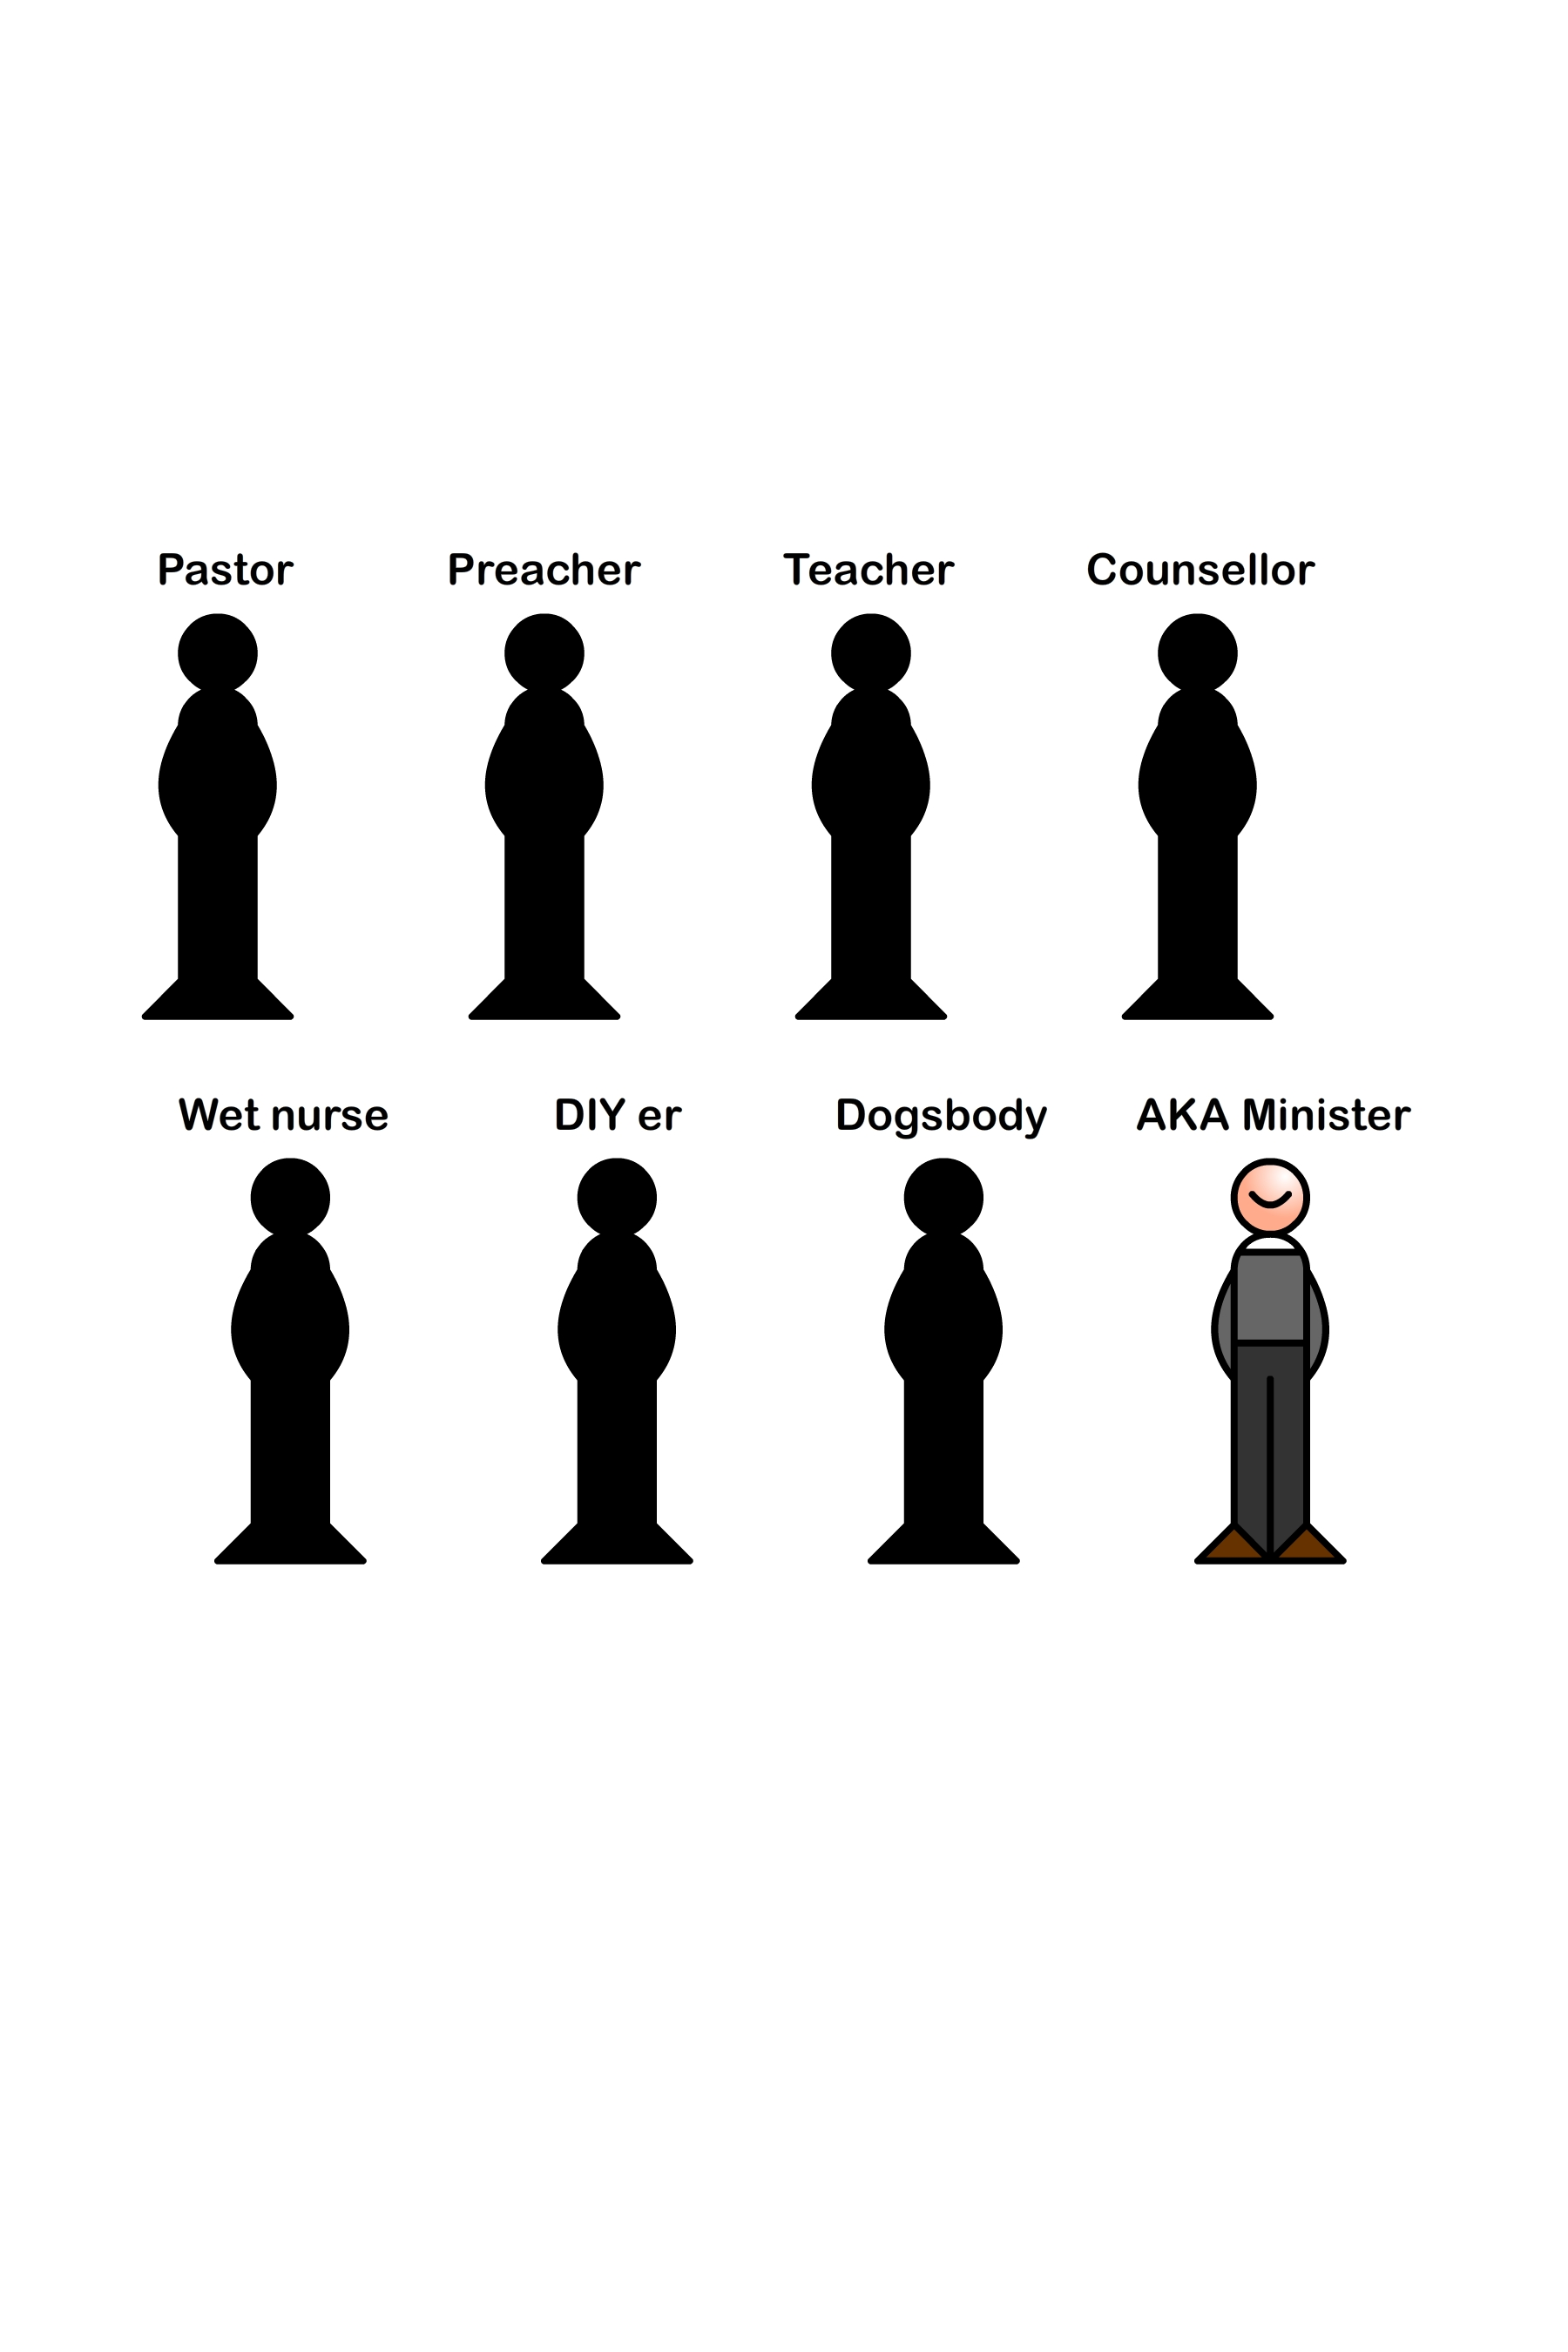 AKA minister.jpg